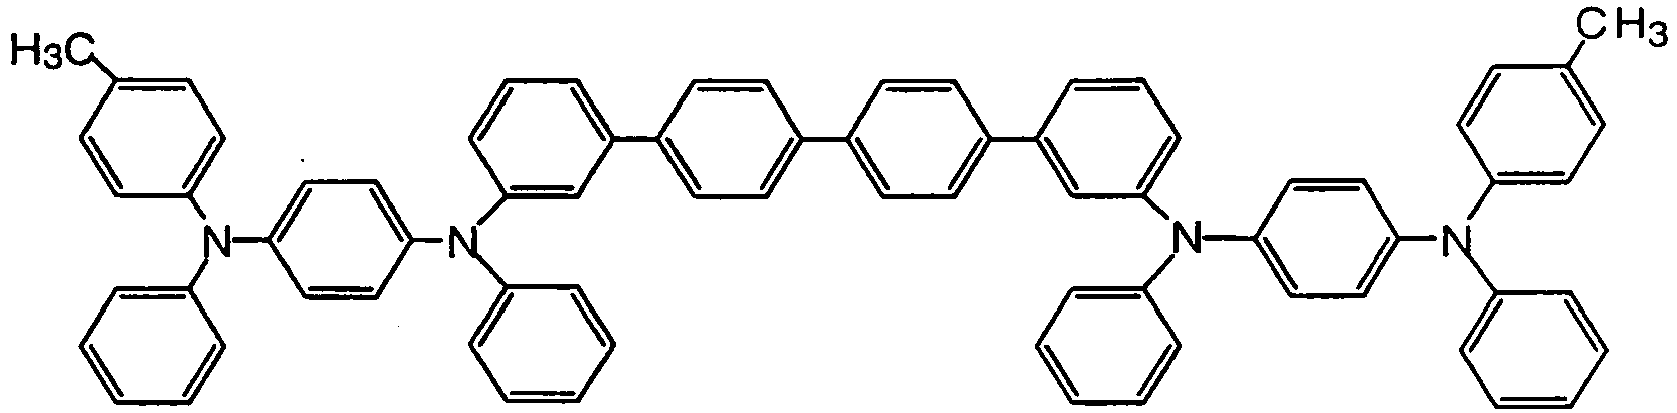 Figure imgb0927